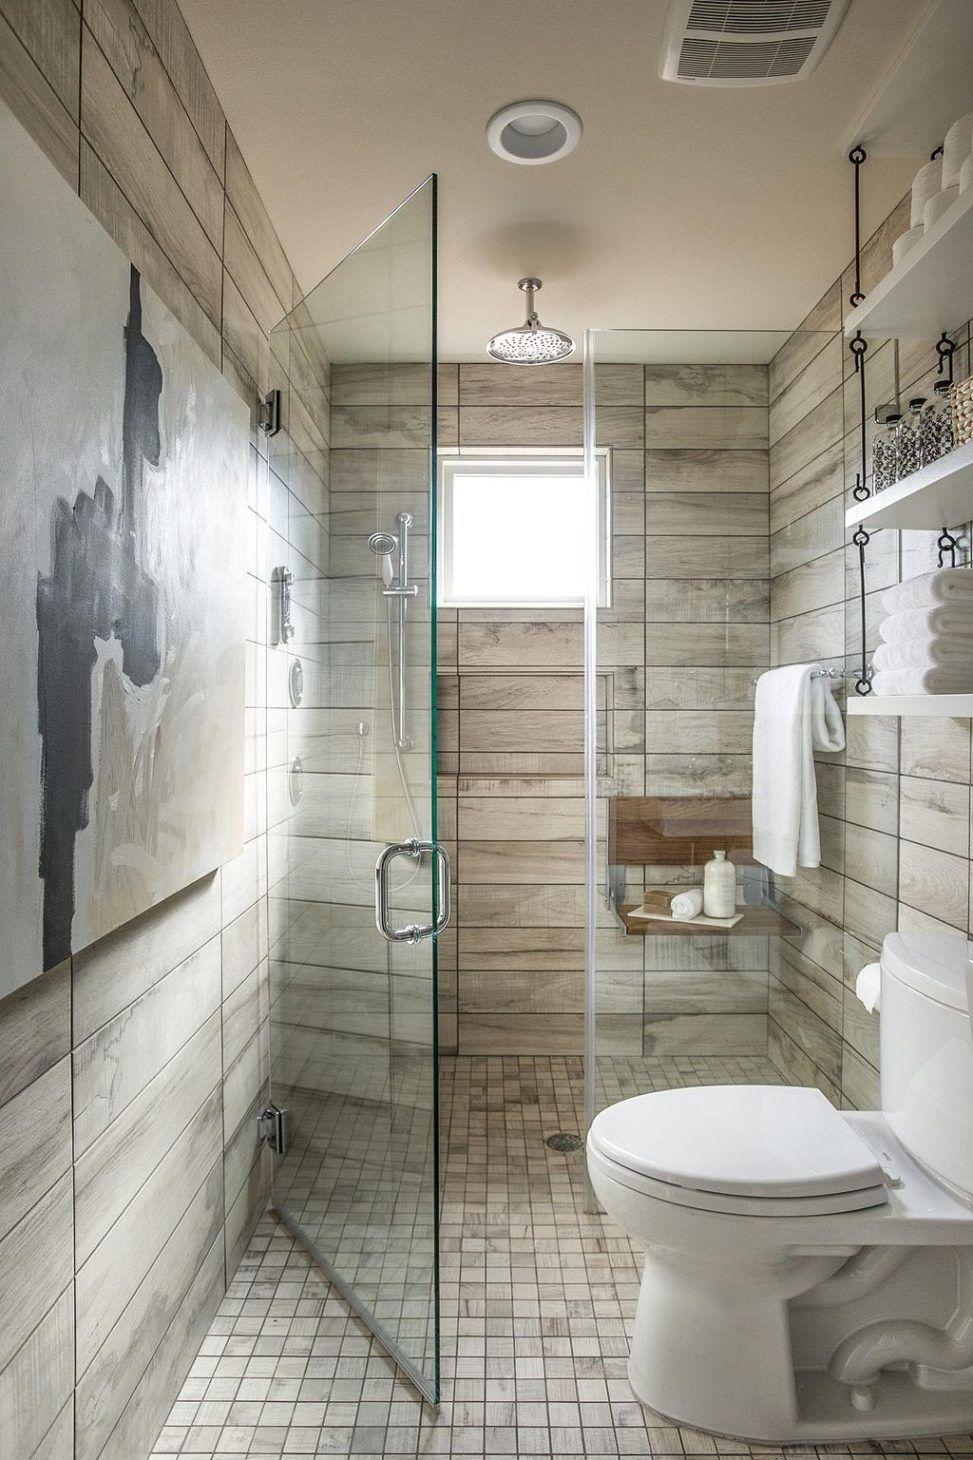 Incredible Small Master Bathroom Remodel Ideas 1 Bathroom Design Small Universal Design Bathroom Bathroom Design Small Modern